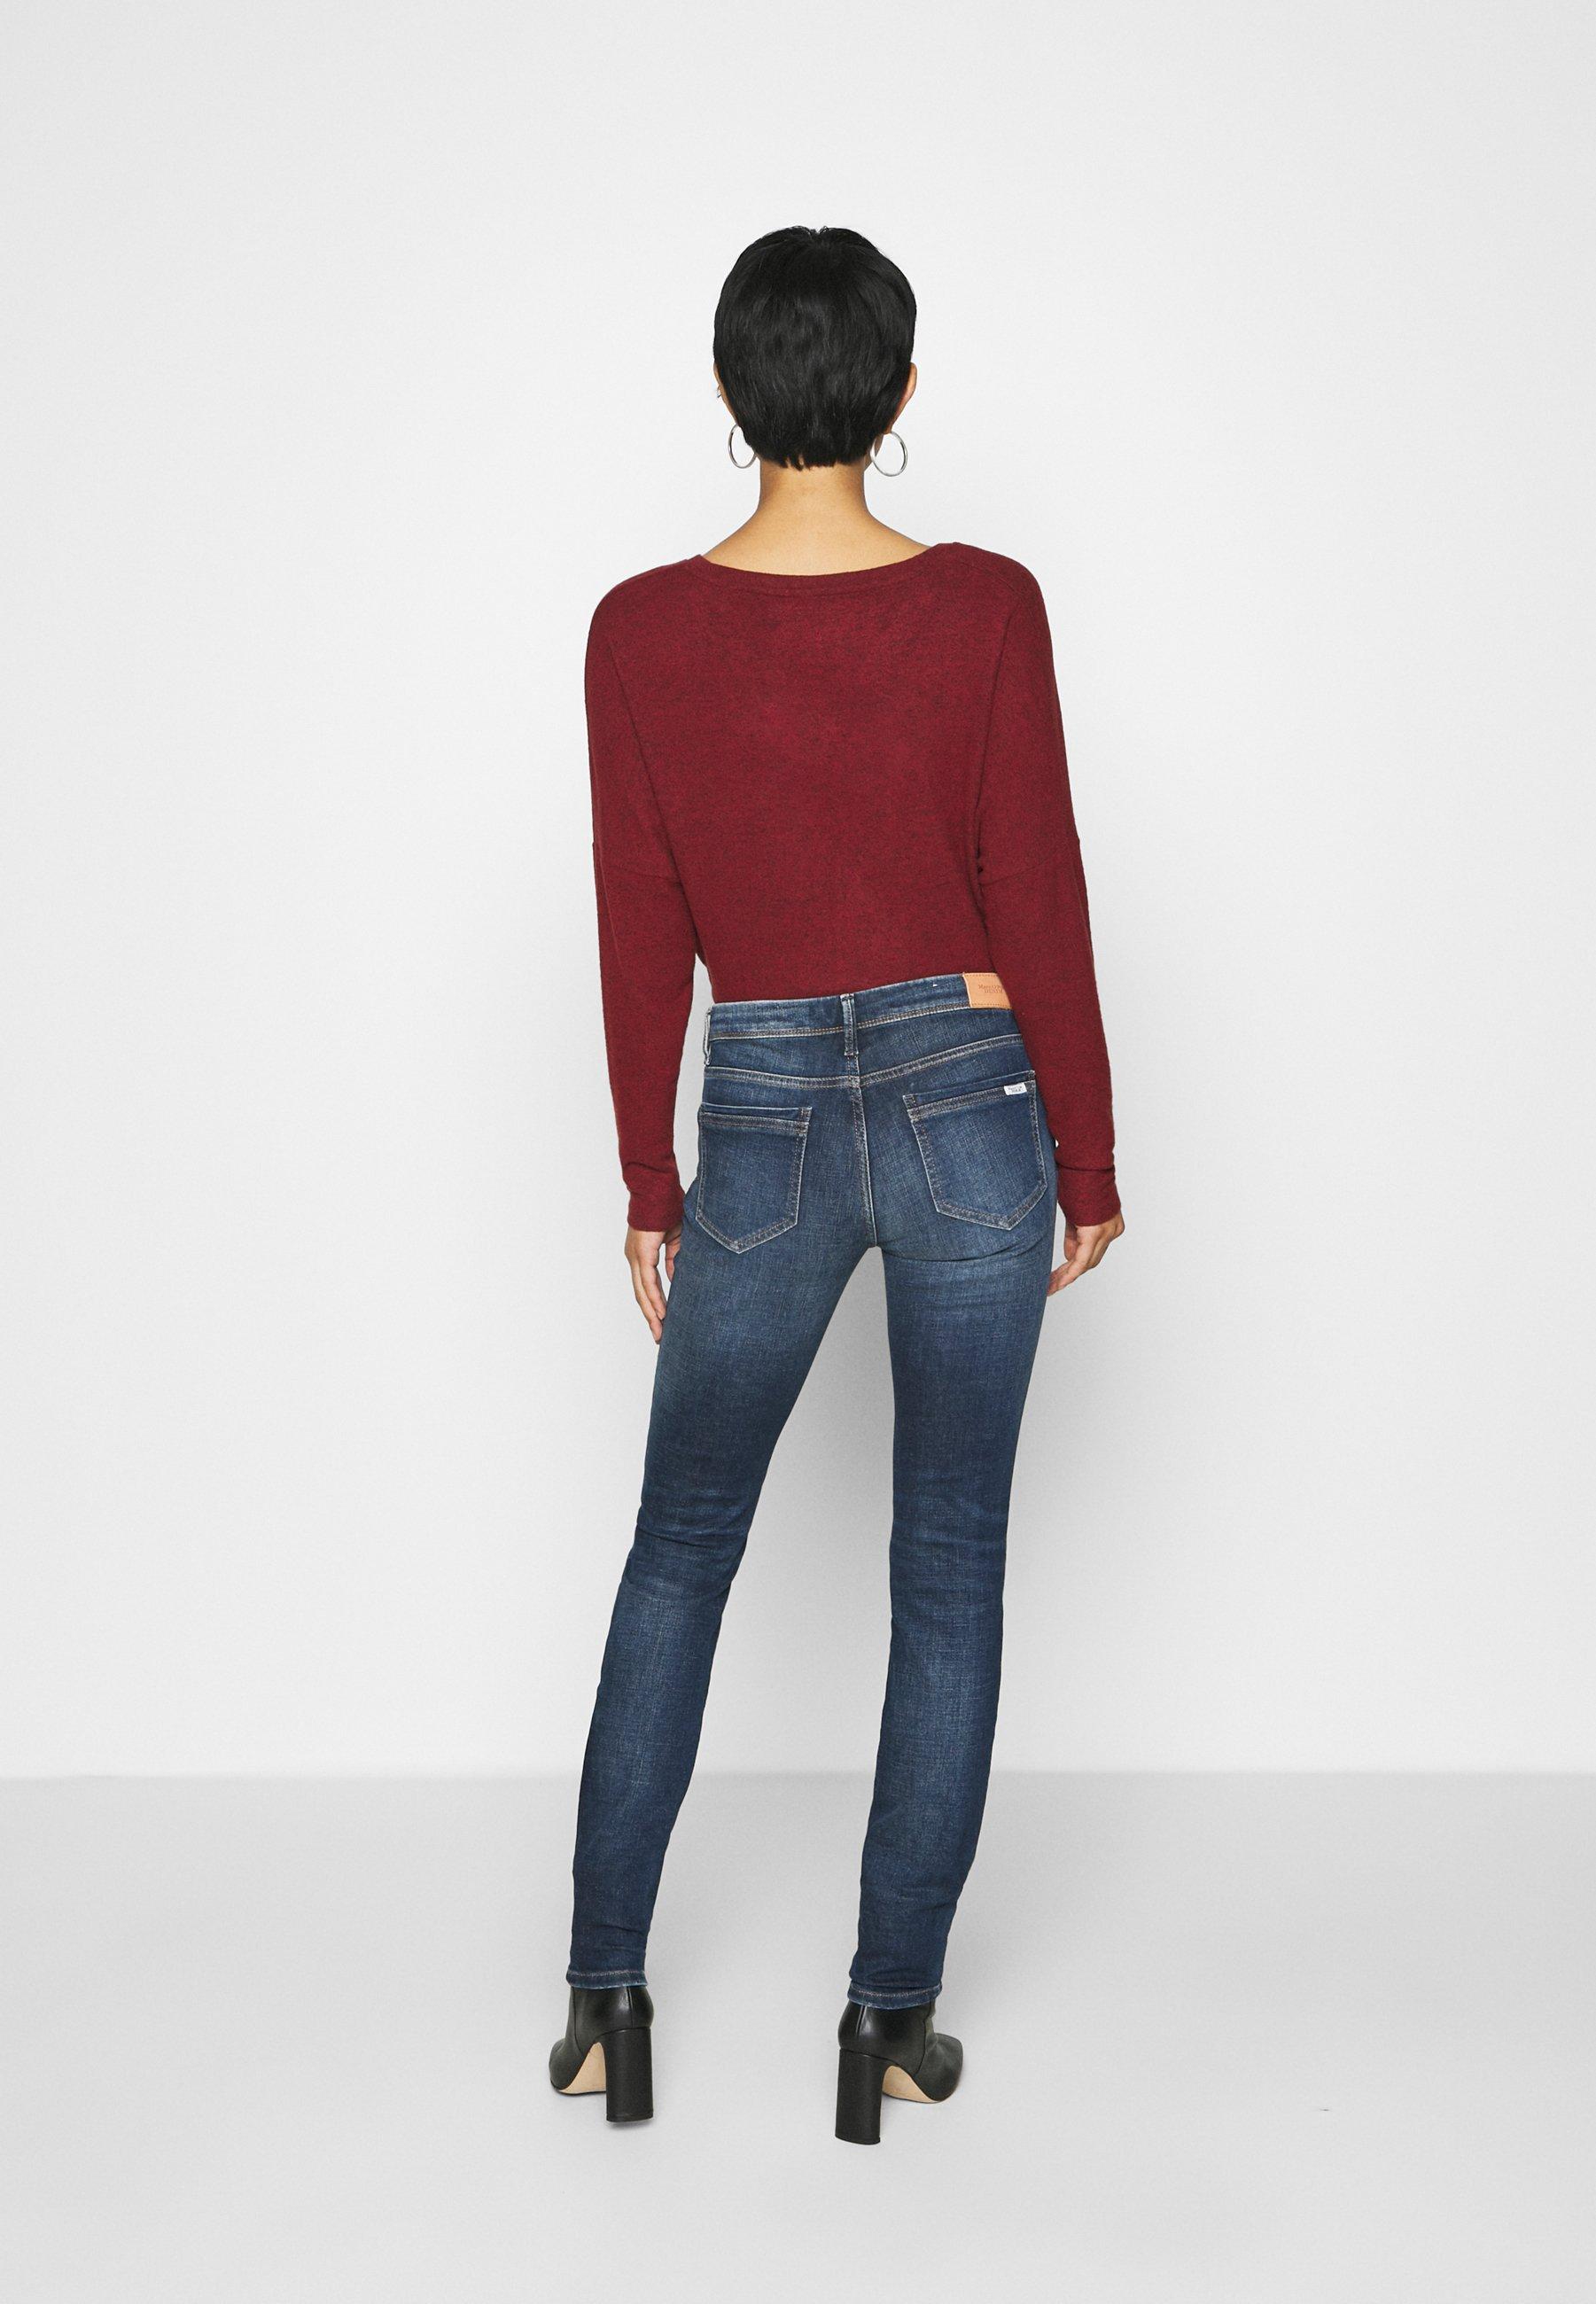 Outlet Women's Clothing Marc O'Polo DENIM ALVA Jeans Skinny Fit dark-blue denim ZO7pXSFa4